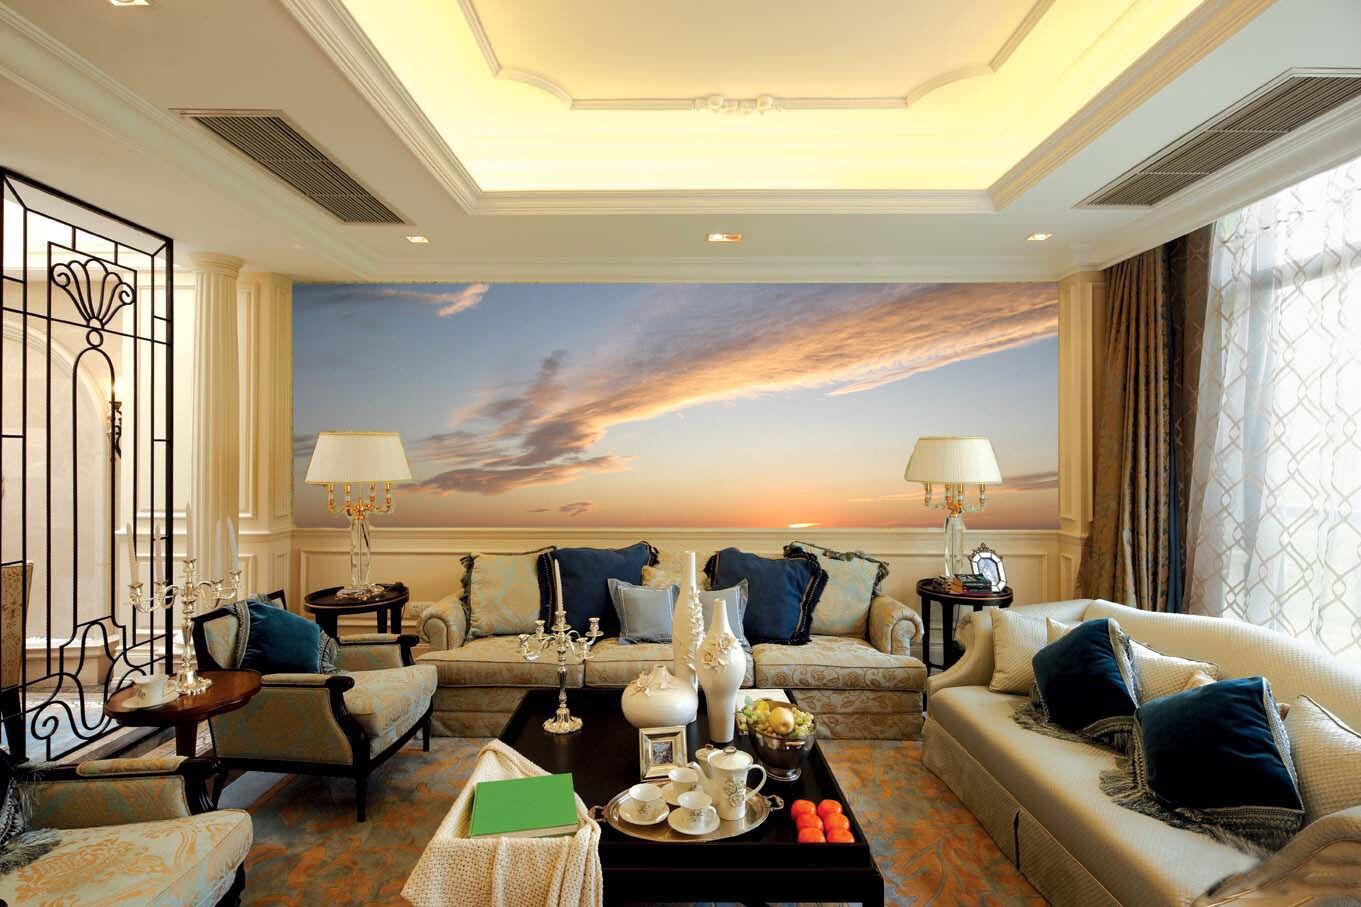 3D 3D 3D Pretty Sunset Glow 3 Wall Paper Wall Print Decal Wall Deco Wall Indoor Murals d35b7d